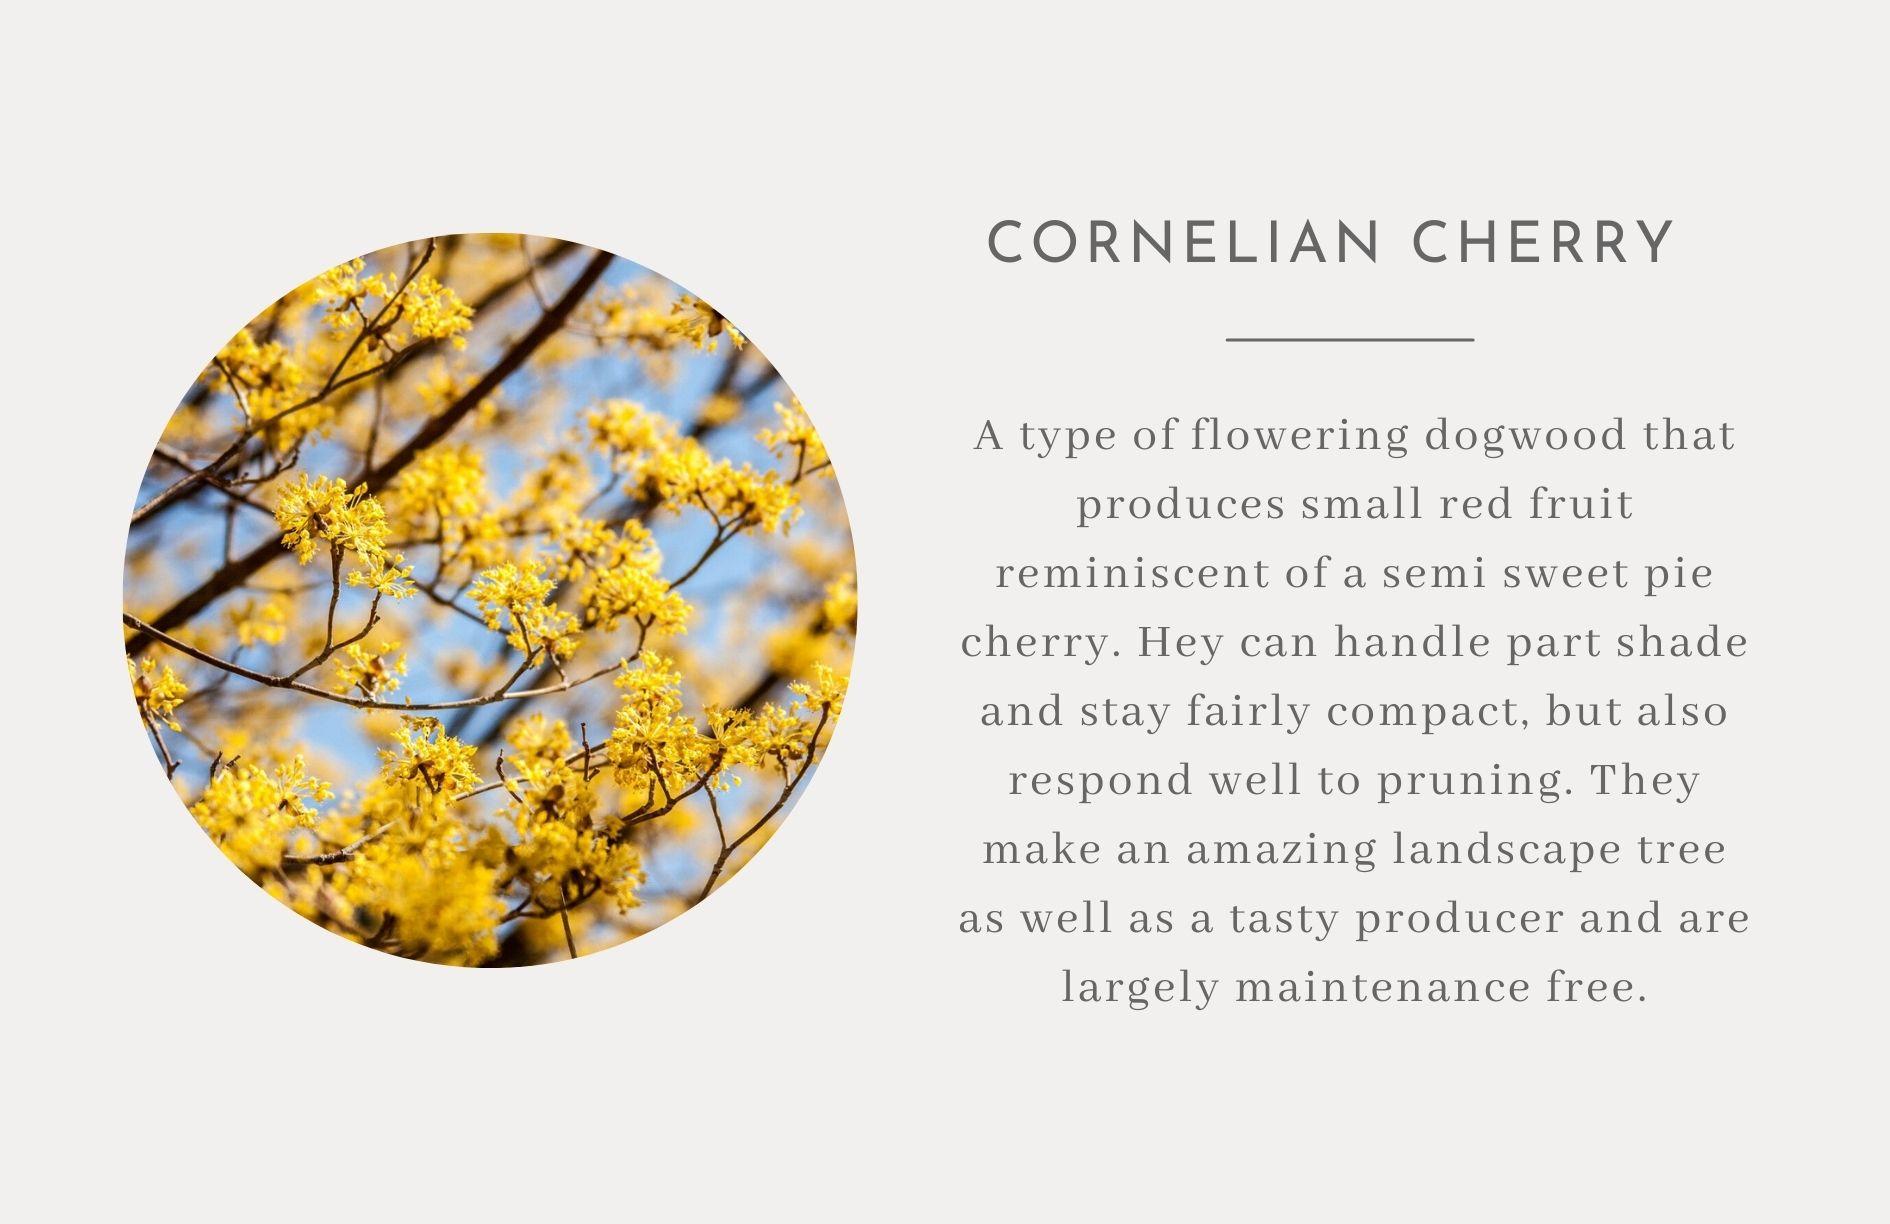 Cornelian Cherry - Edible landscape ideas